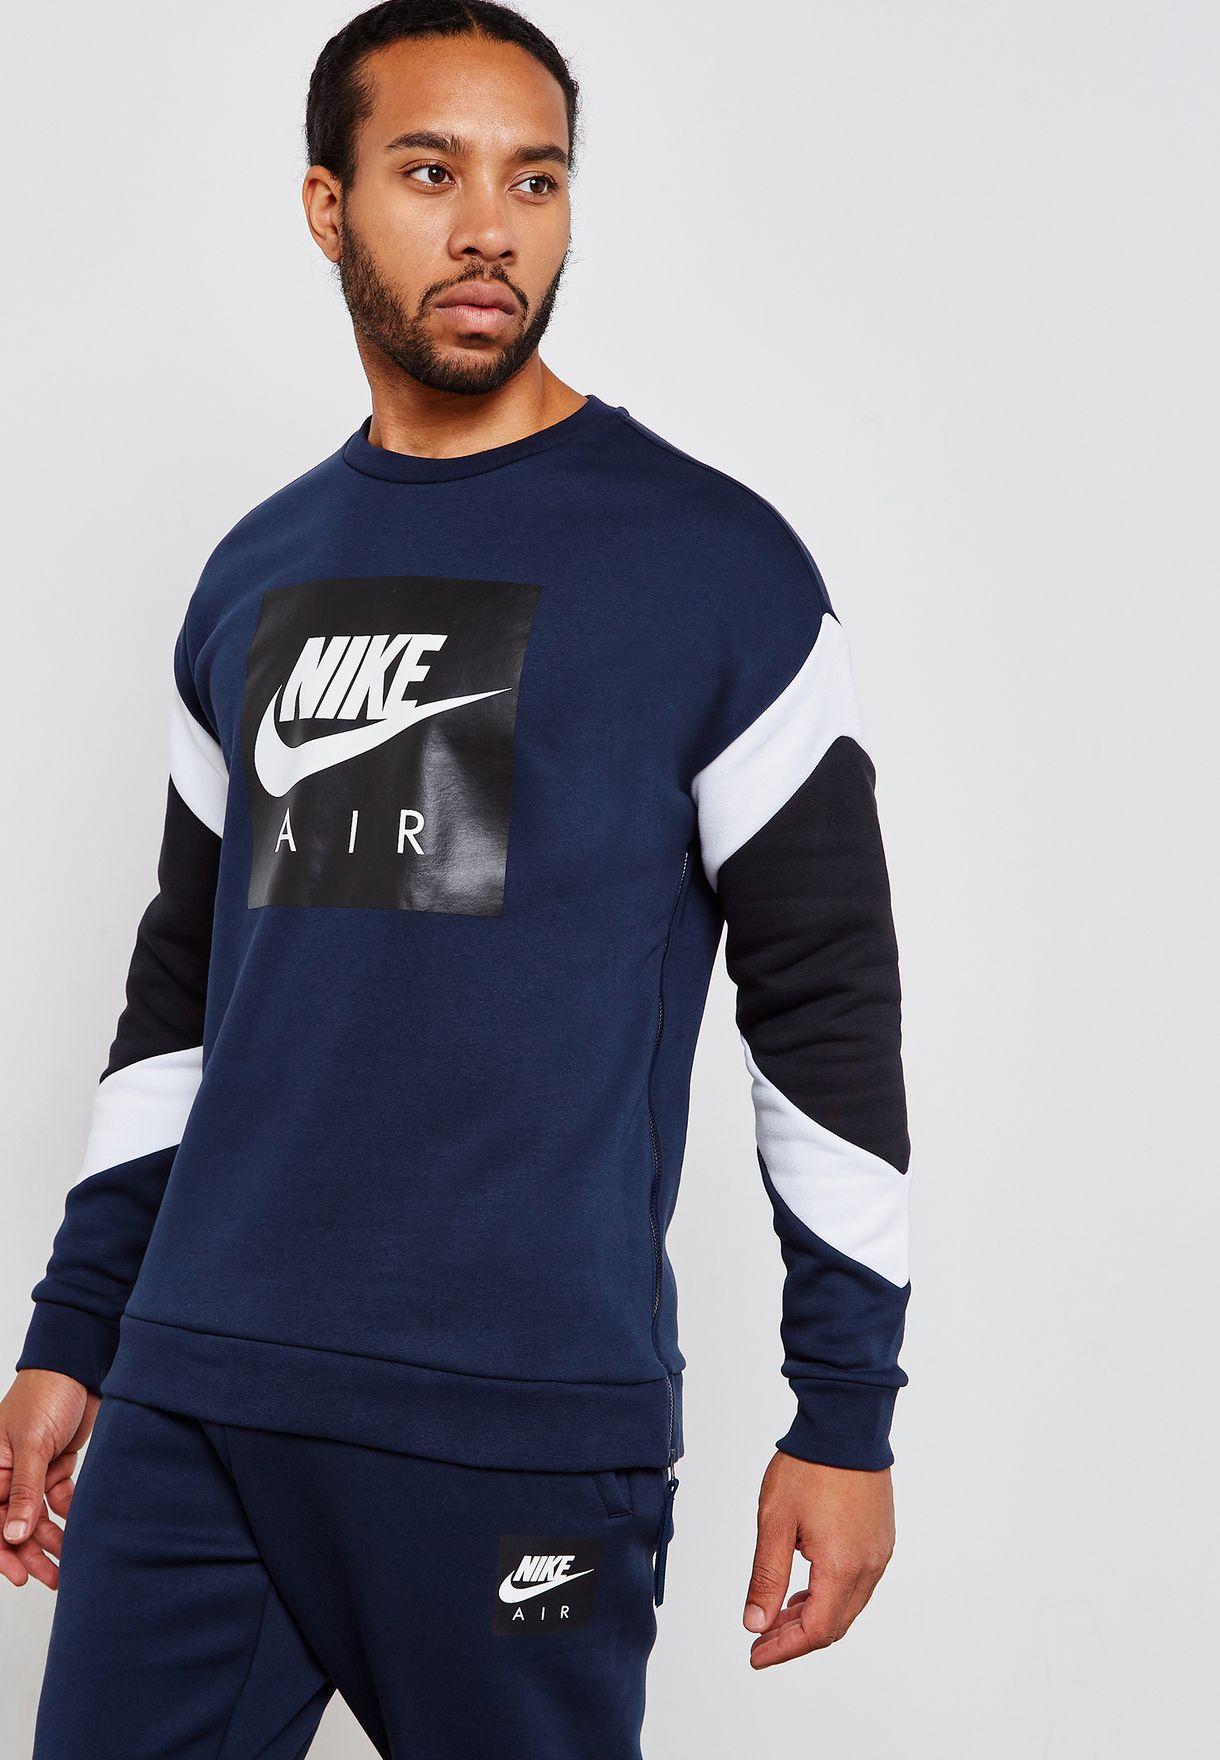 a29642fb46fd Shop Nike navy Air Fleece Sweatshirt 928635-452 for Men in UAE ...